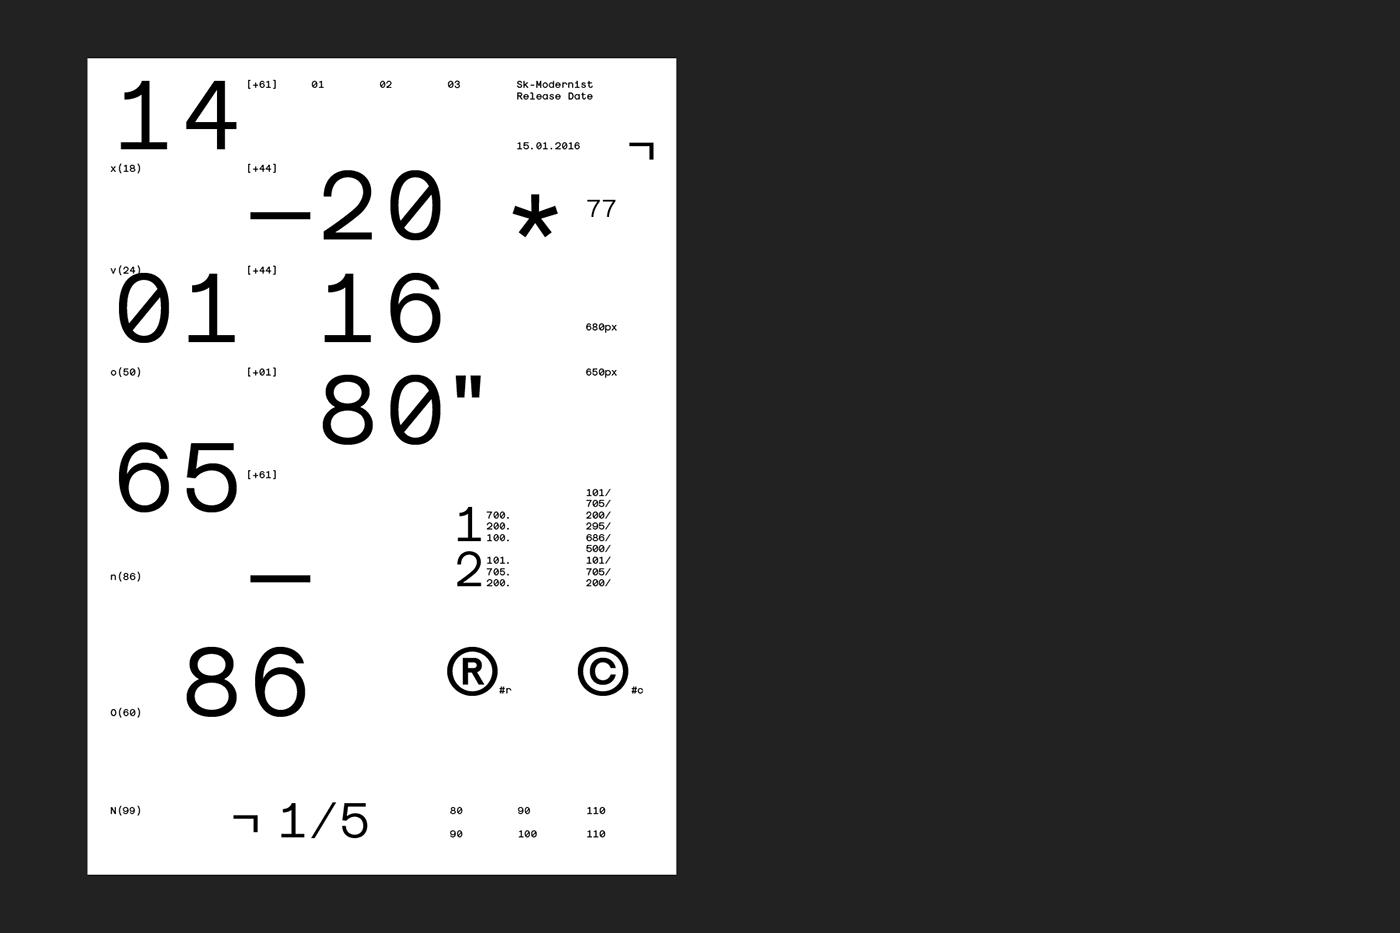 Monochromatic modernist minimalist sans serif monospaced helvetica Futura avant garde font clean vietnamese light Latin